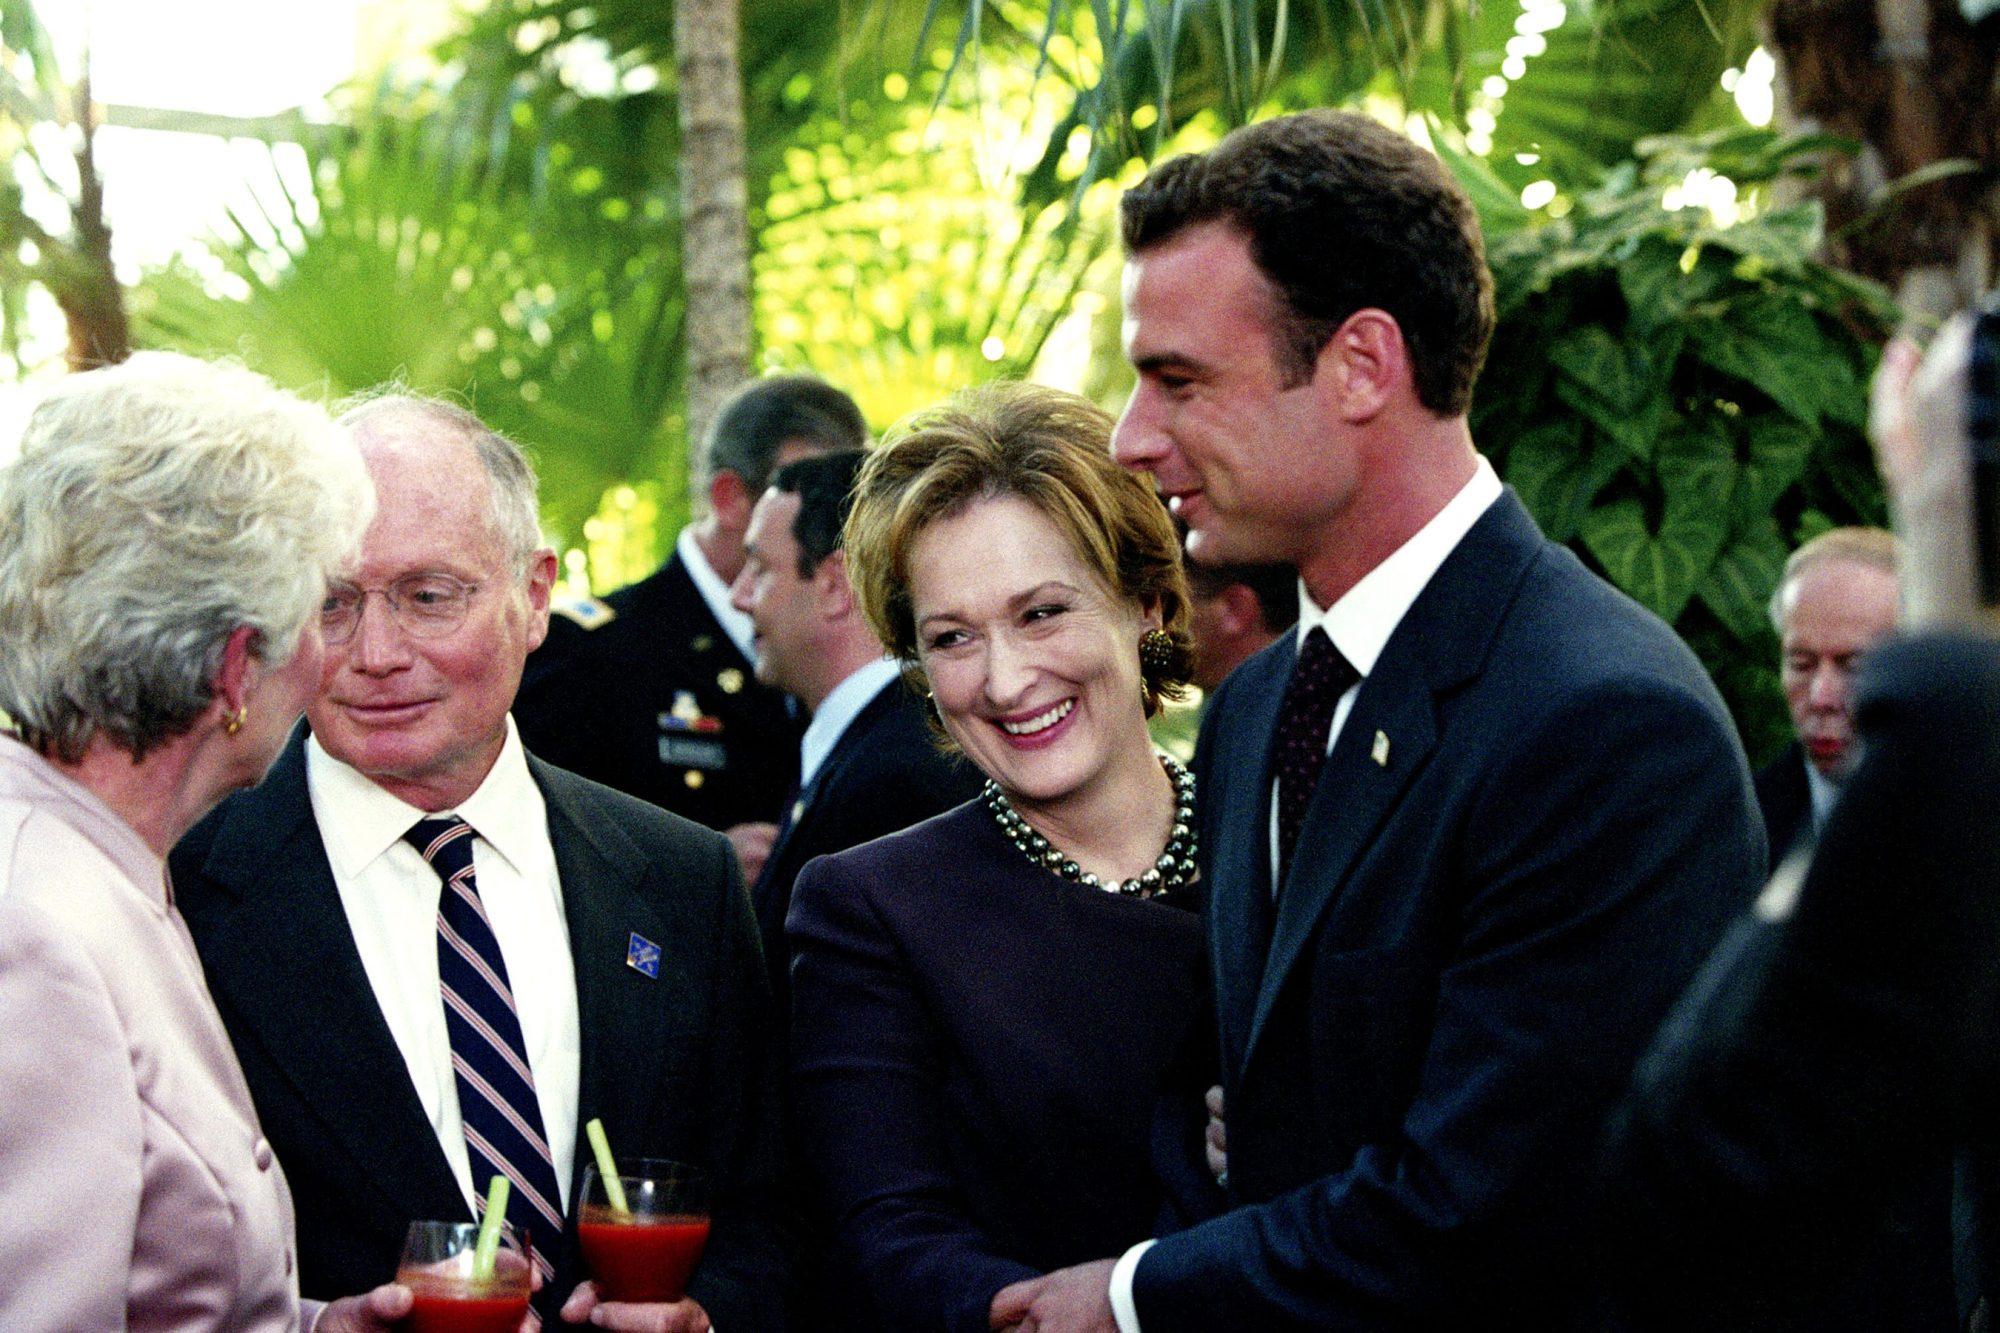 THE MANCHURIAN CANDIDATE, Meryl Streep, Liev Schreiber, 2004, (c) Paramount/courtesy Everett Collect